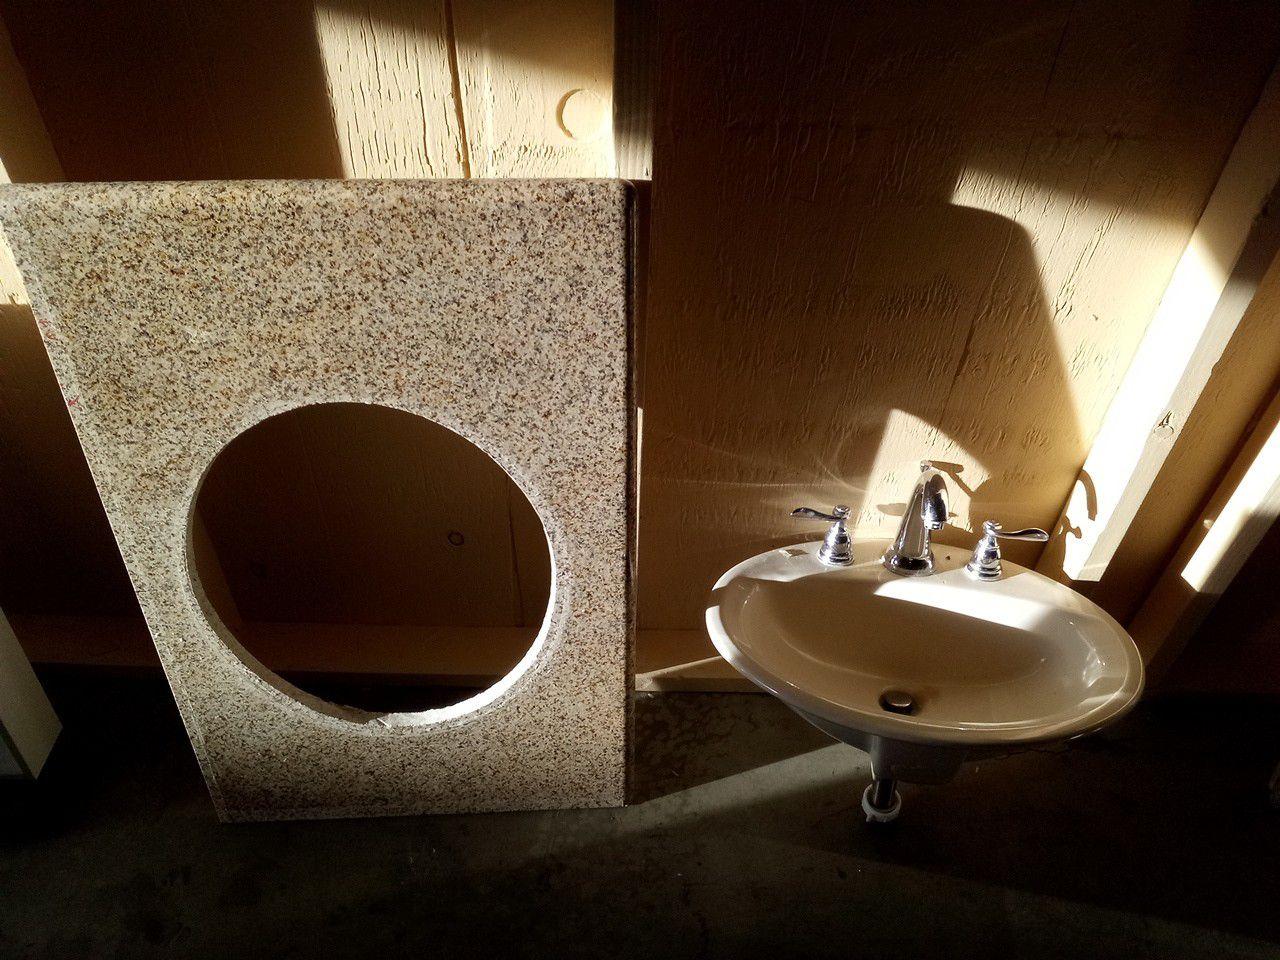 36 inch granite top and sink faucet